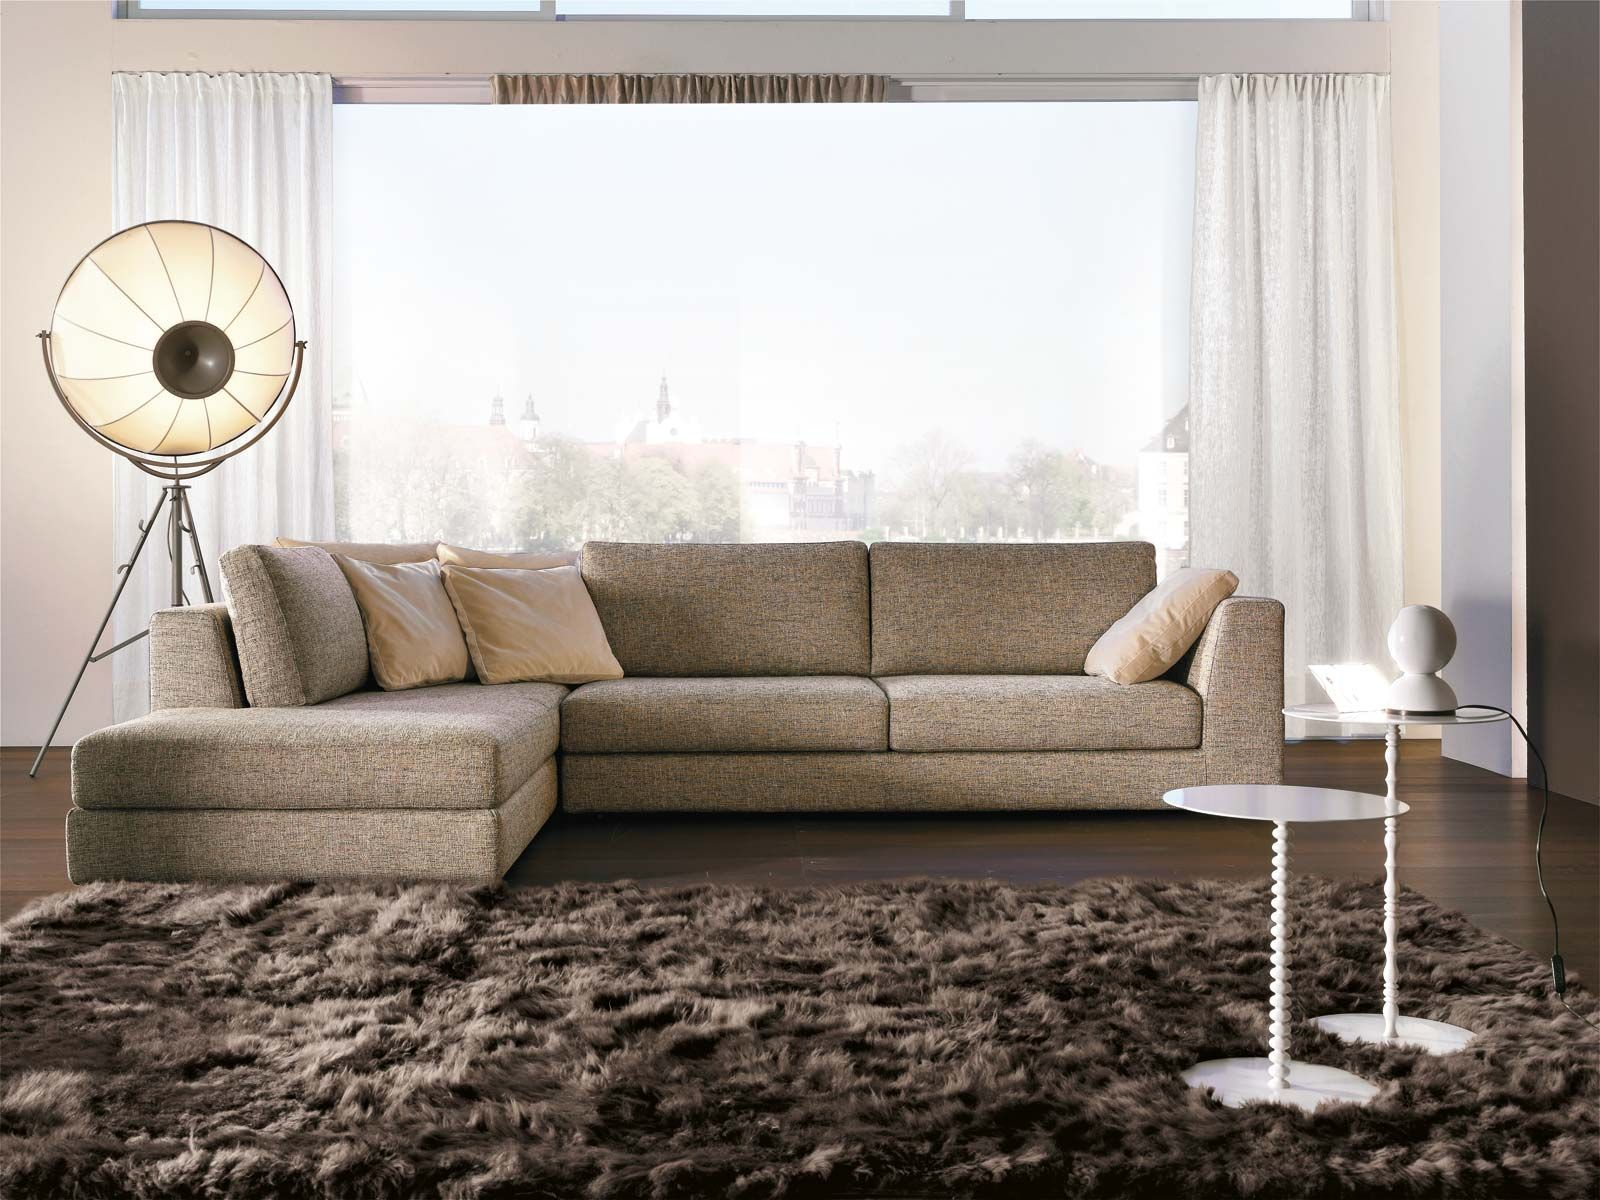 Musa spa divani e poltrone sofas and armchairs ester sofas pinterest armchairs - Salon poltron et sofa ...